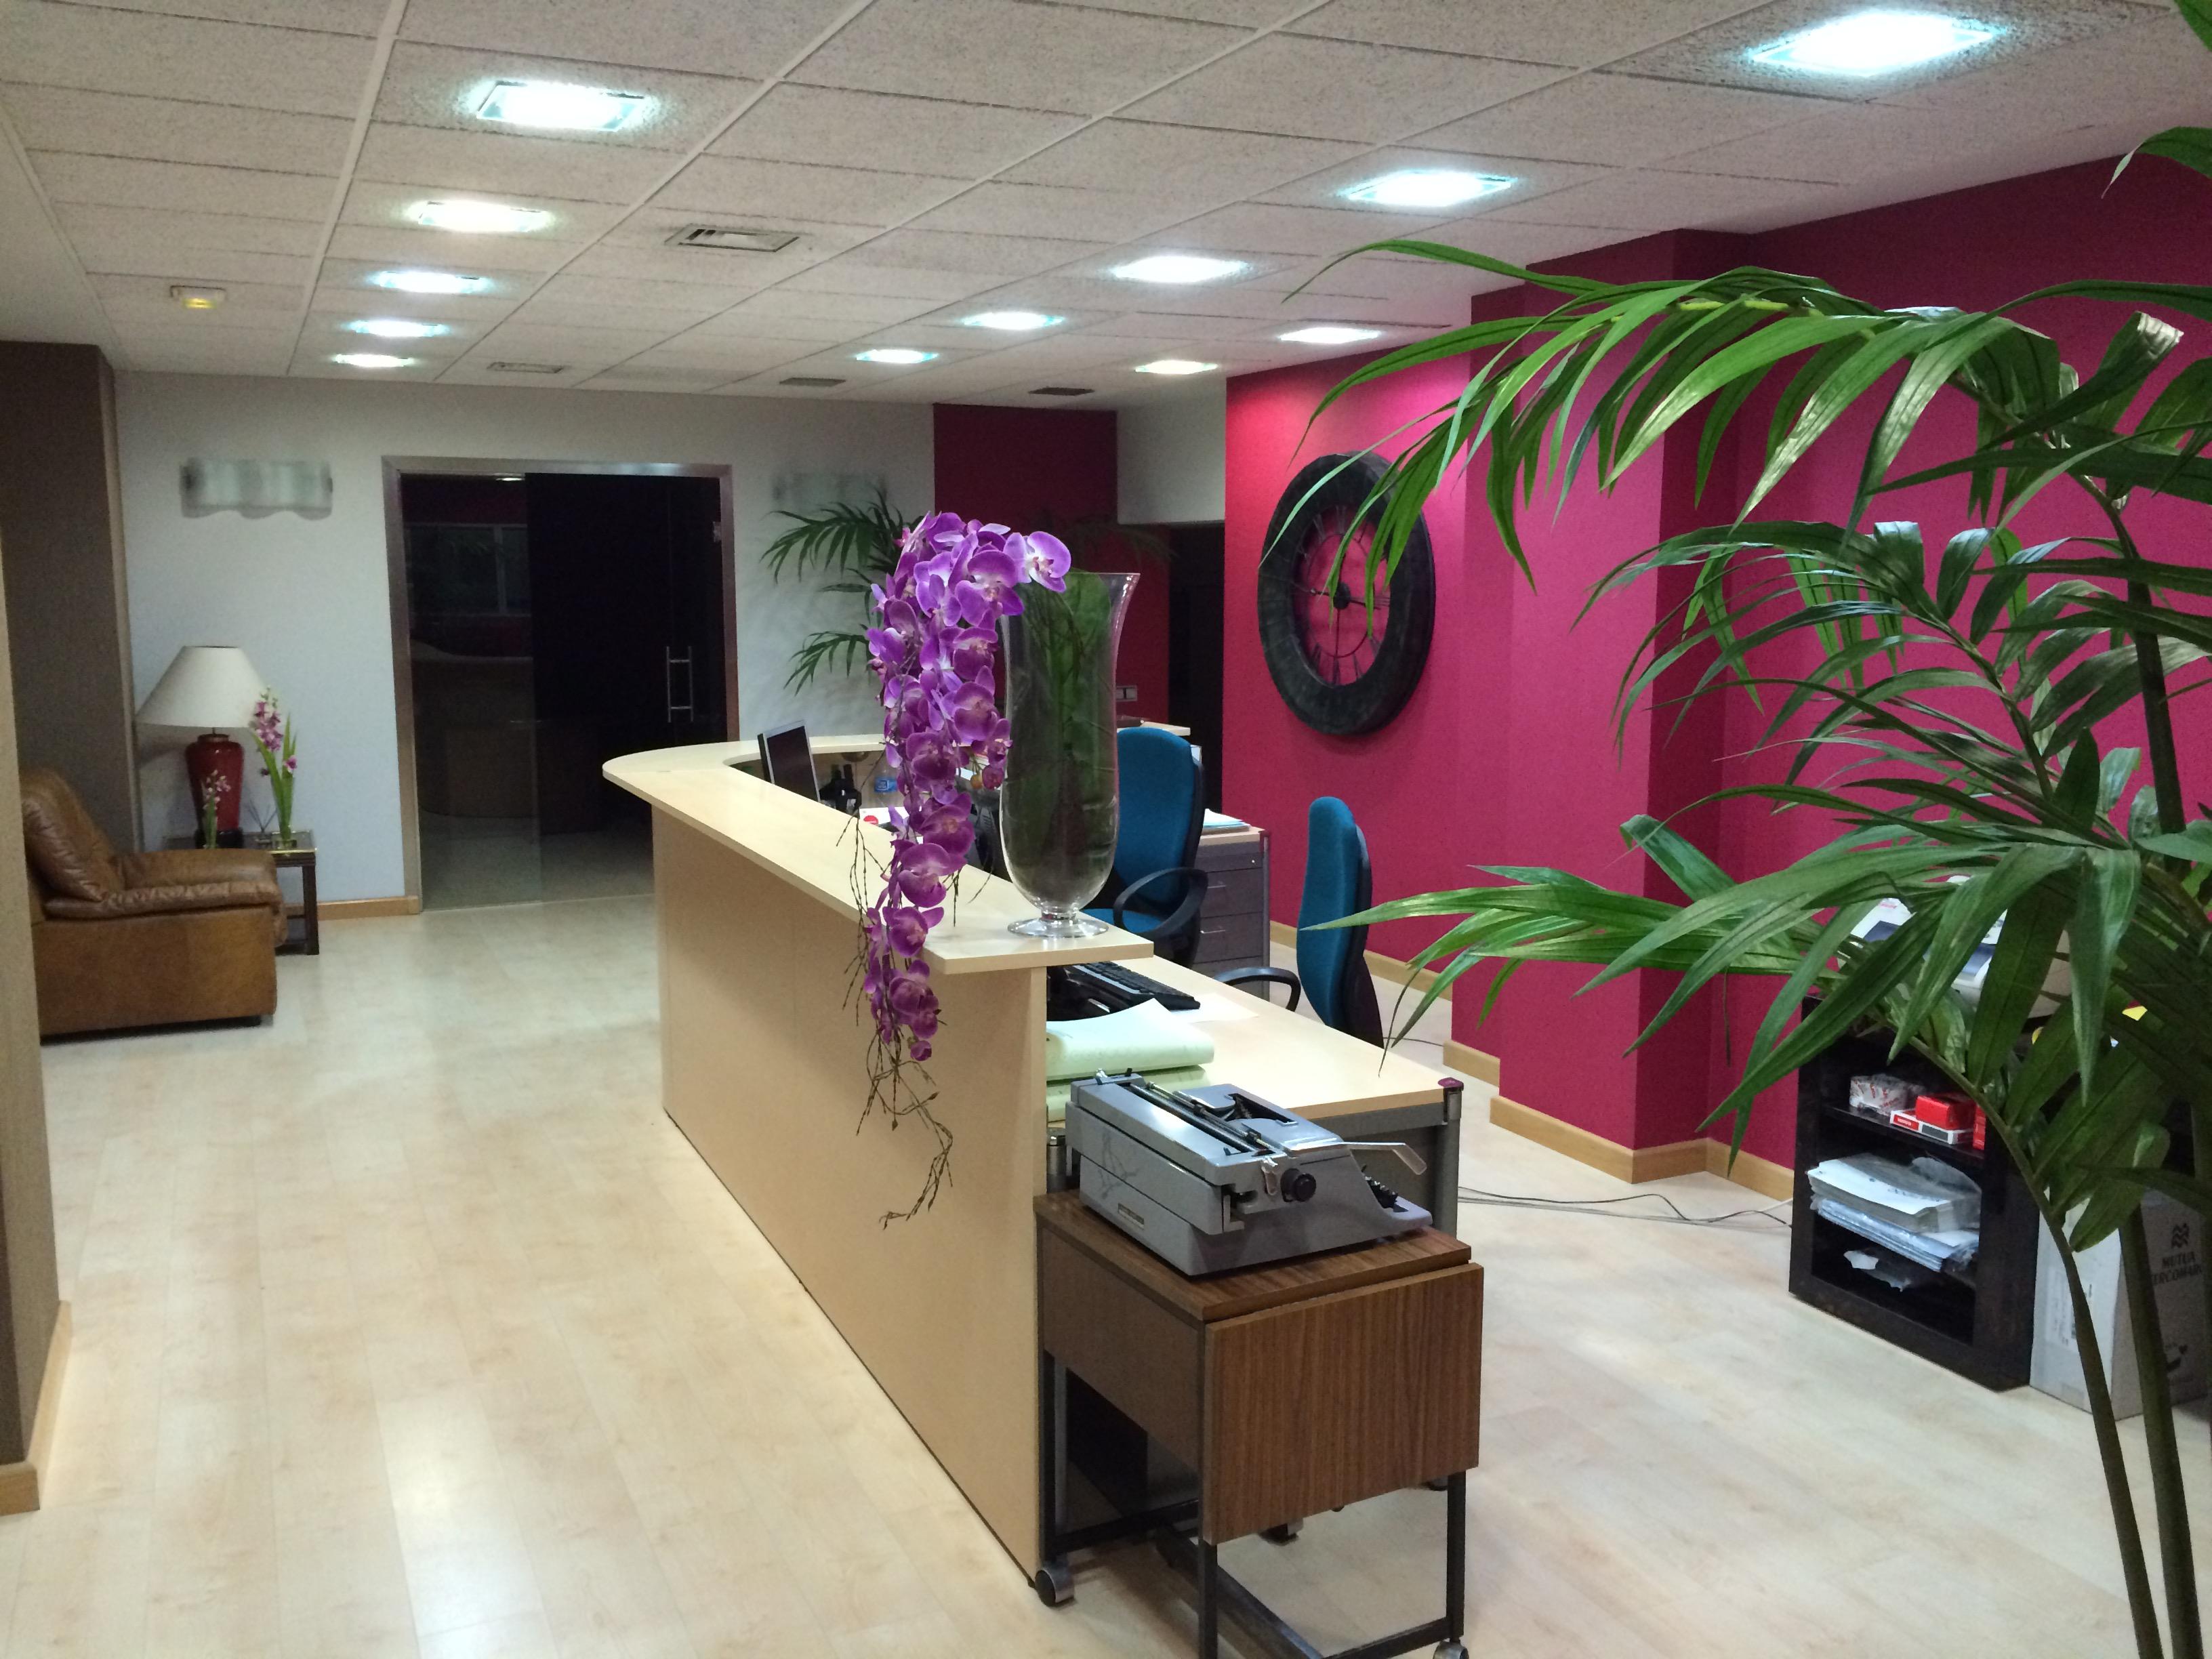 oficina Alavarez Auditores